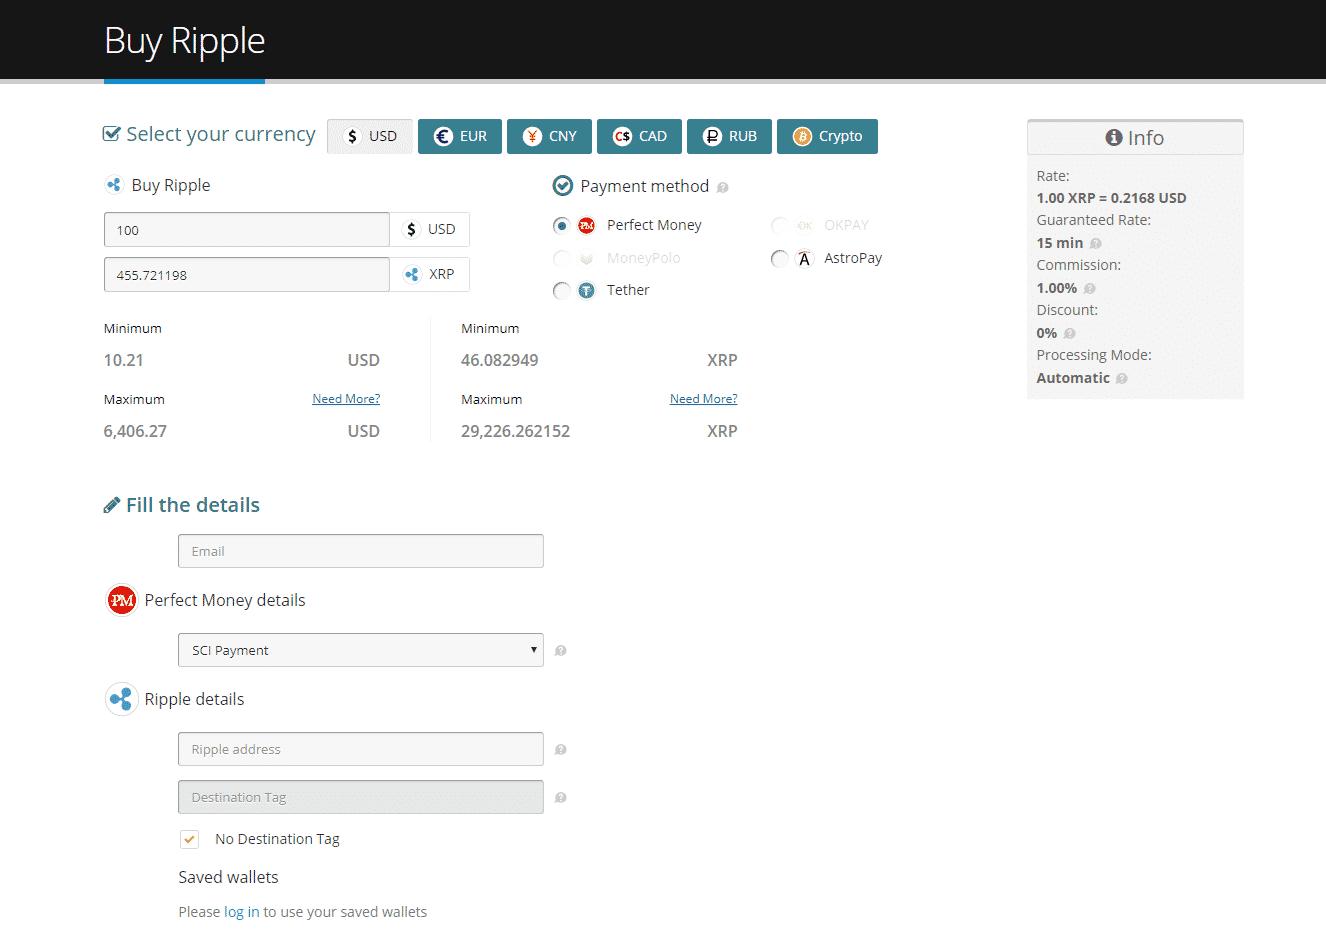 Buy-Ripple كيفية شراء عملة الريبل Ripple بسرعة وتخزينها في أفضل محفظة رقمية